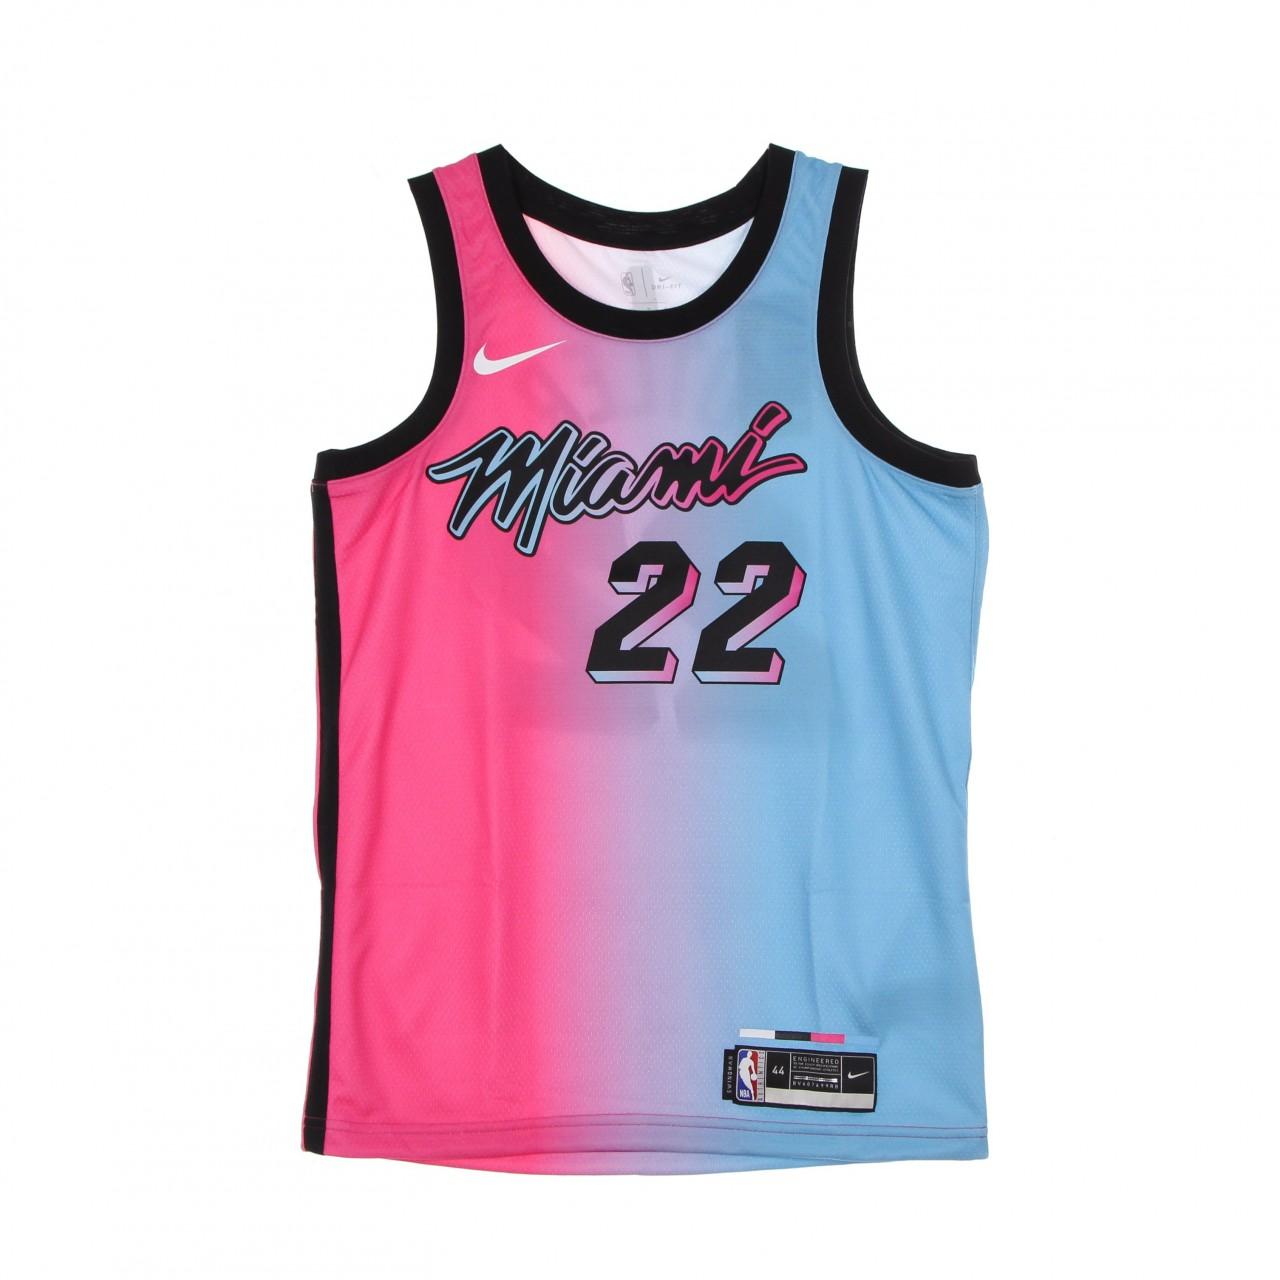 NIKE NBA NBA SWINGMAN JERSEY CITY EDITION 2020 N.22 JIMMY BUTLER MIAHEA CN1741-687